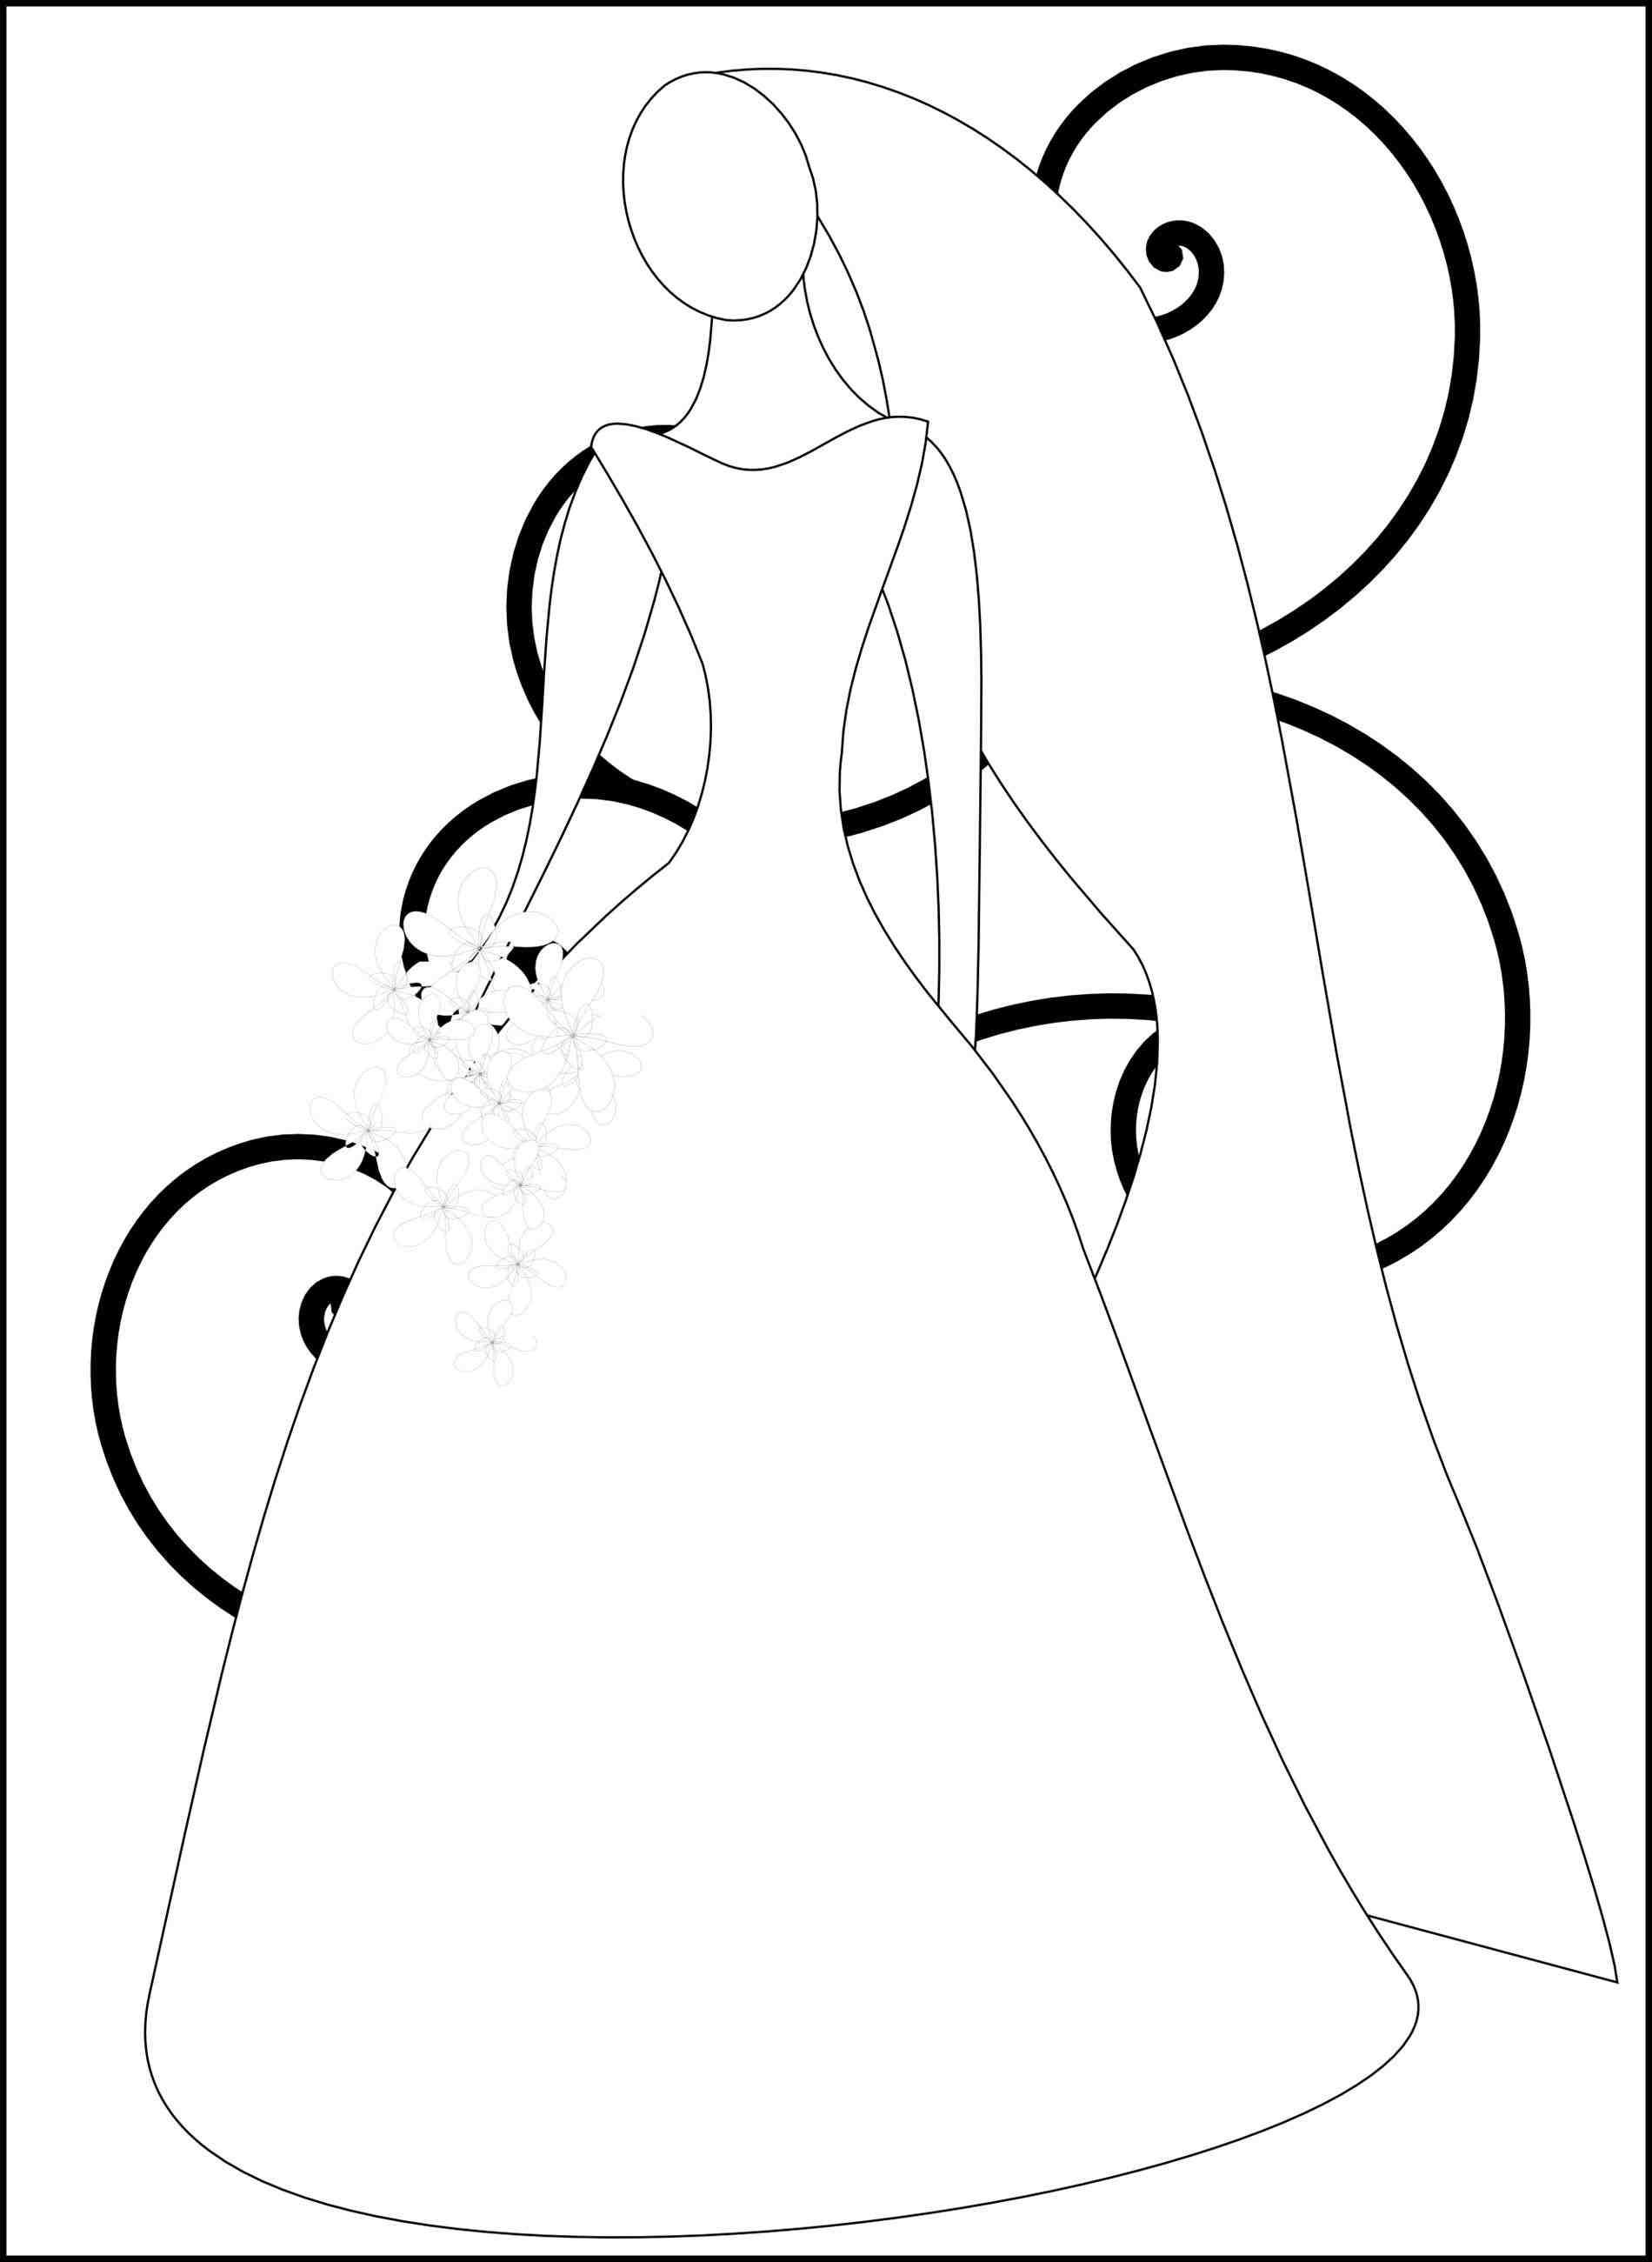 Bridal shower clipart free download best bridal shower for Bridal shower coloring pages